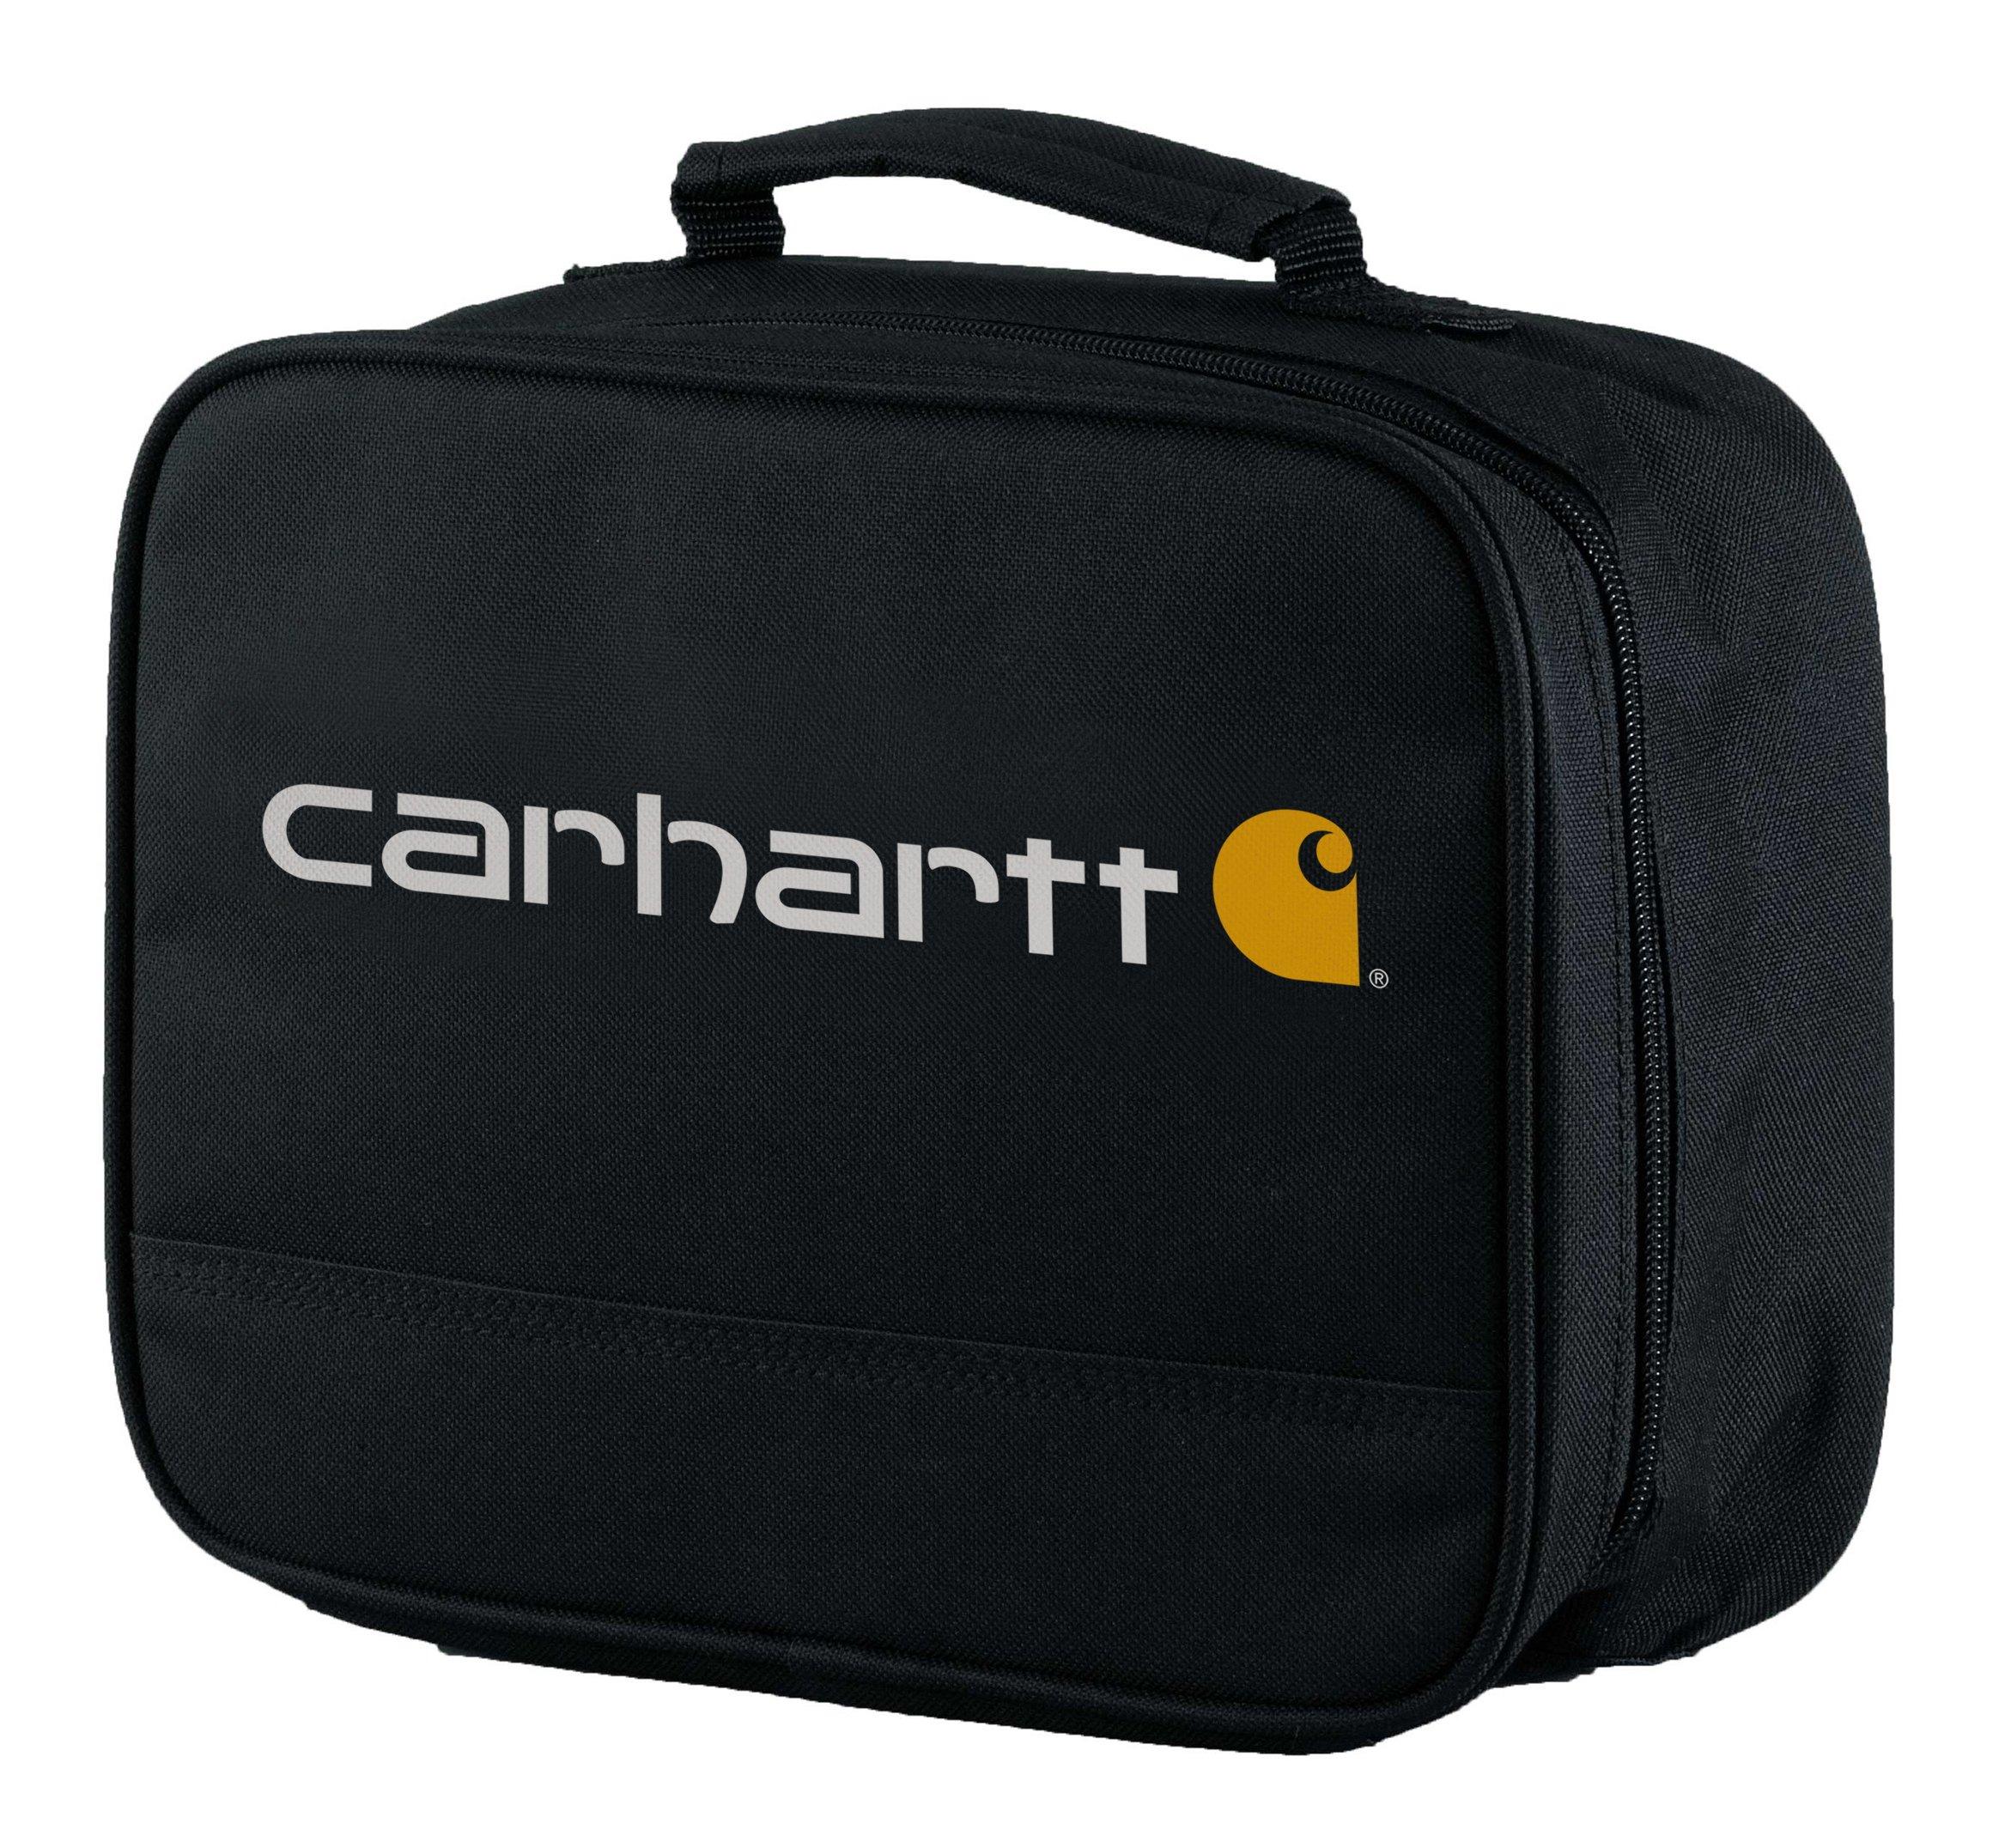 Carhartt Kids' Insulated Soft-Sided School Lunchbox, Black